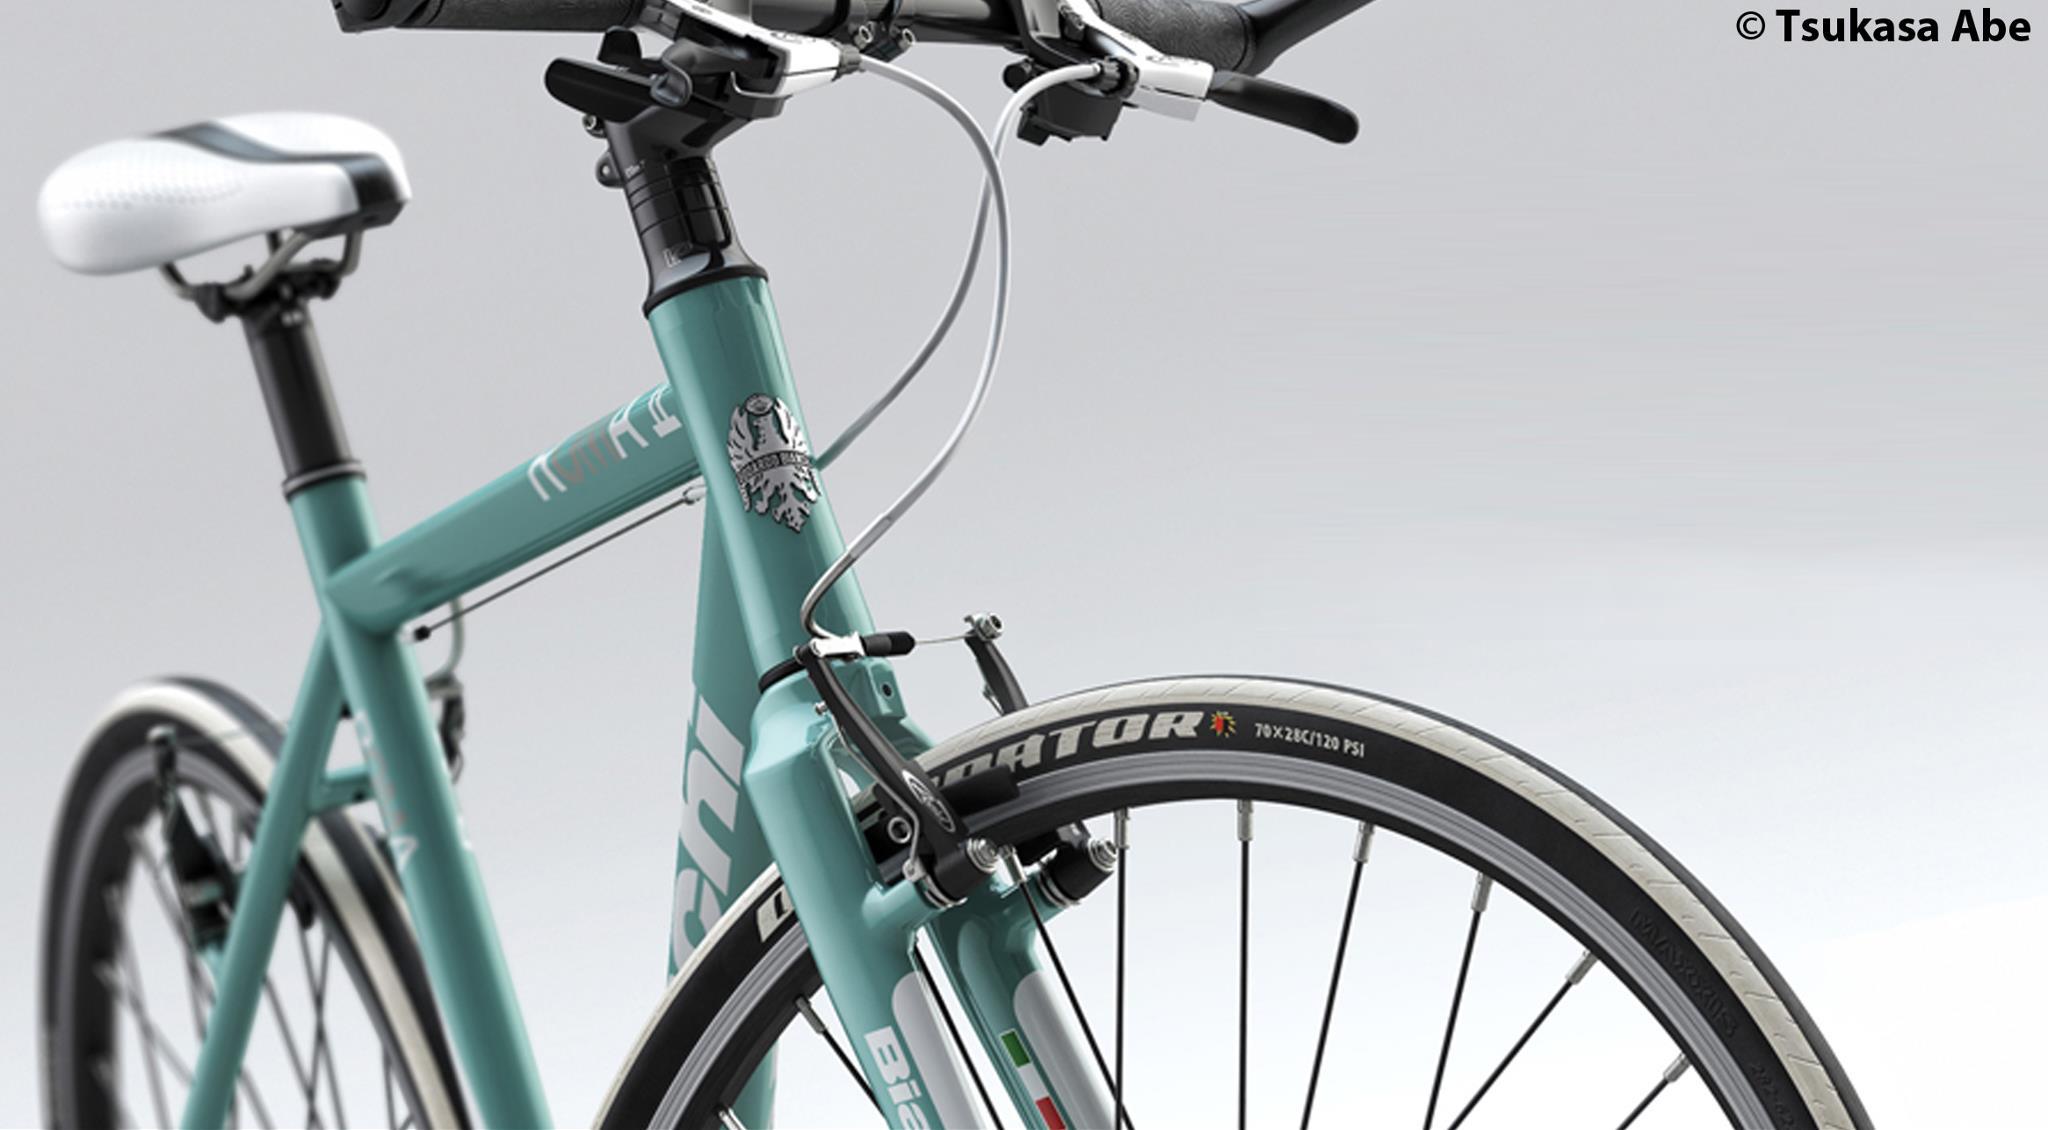 3d-cinema4d-hdr-light-studio-tsukasa-abe-bike